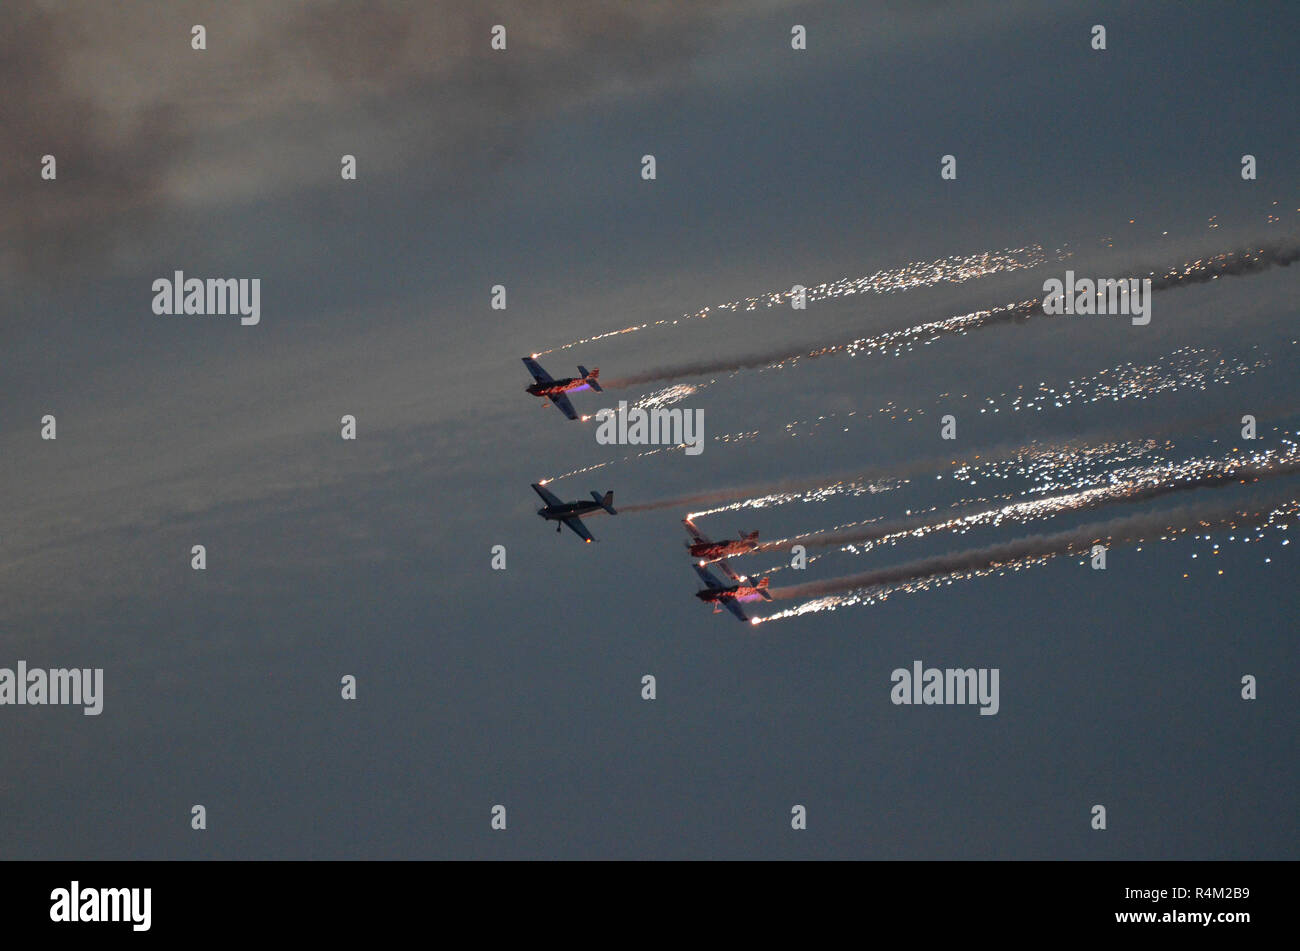 Global Stars aerobatic team, Bahrain Air Show Stock Photo